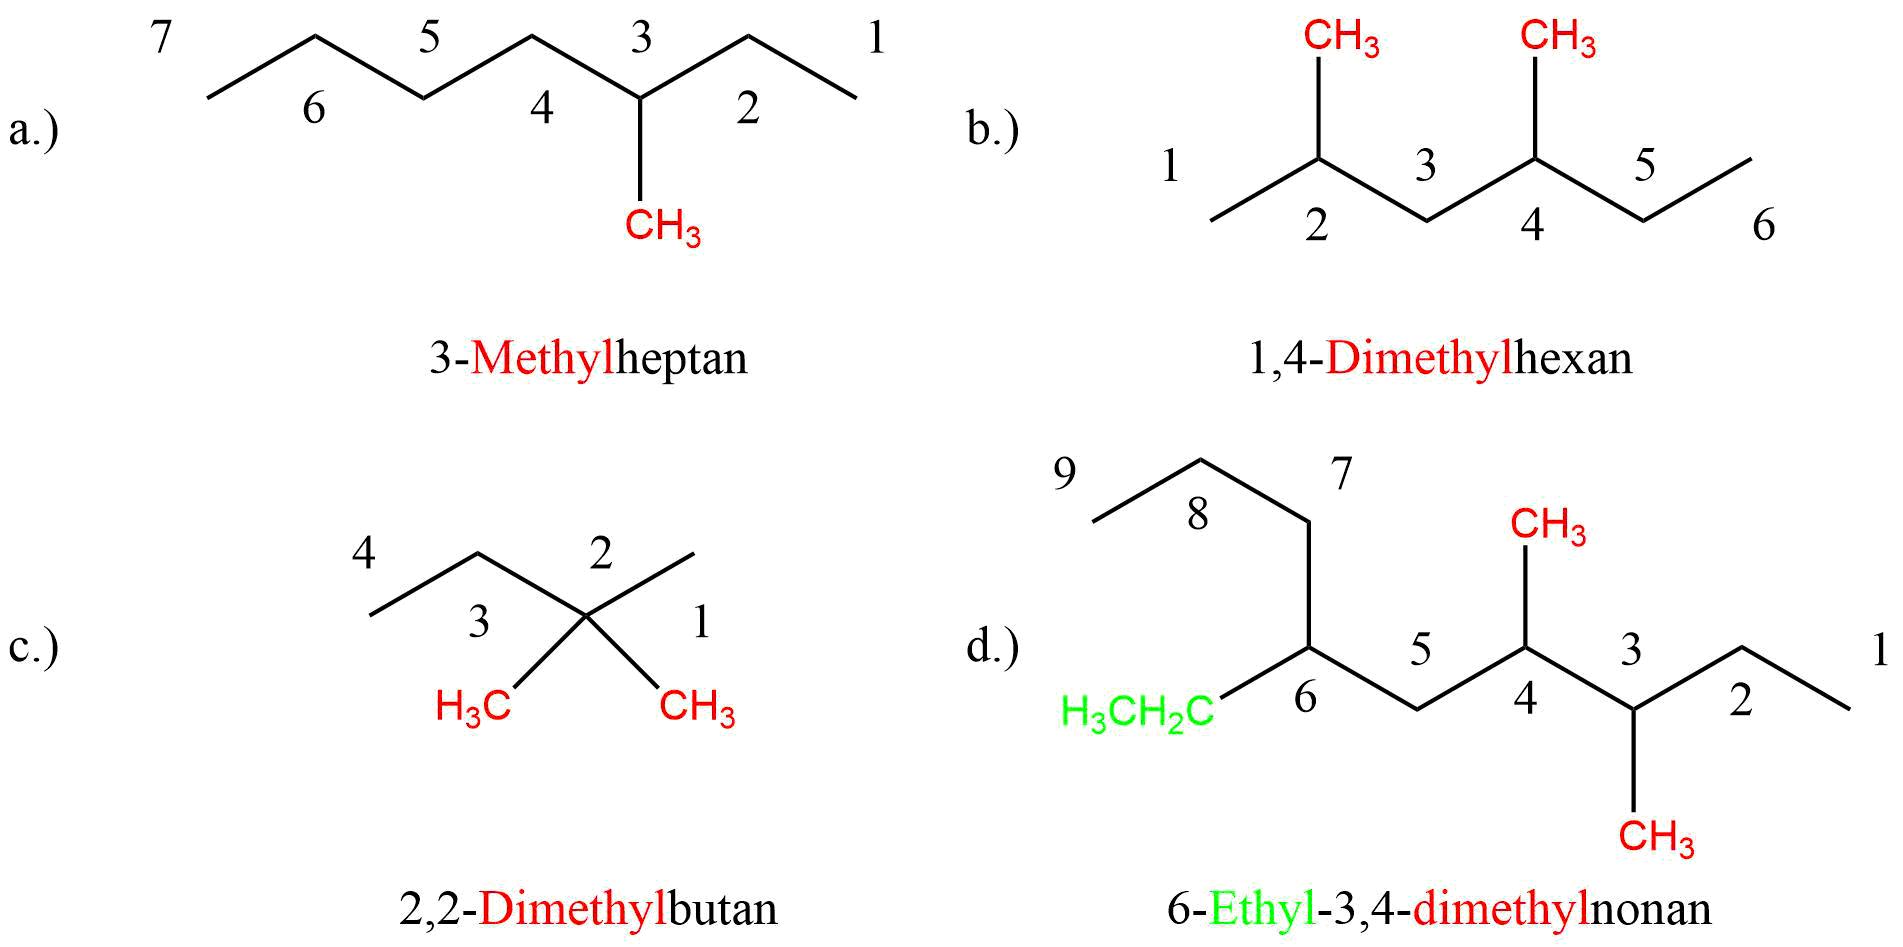 bung-zur-Nomenklatur-der-Alkane-Lösung-I Nomenklatur der Alkane